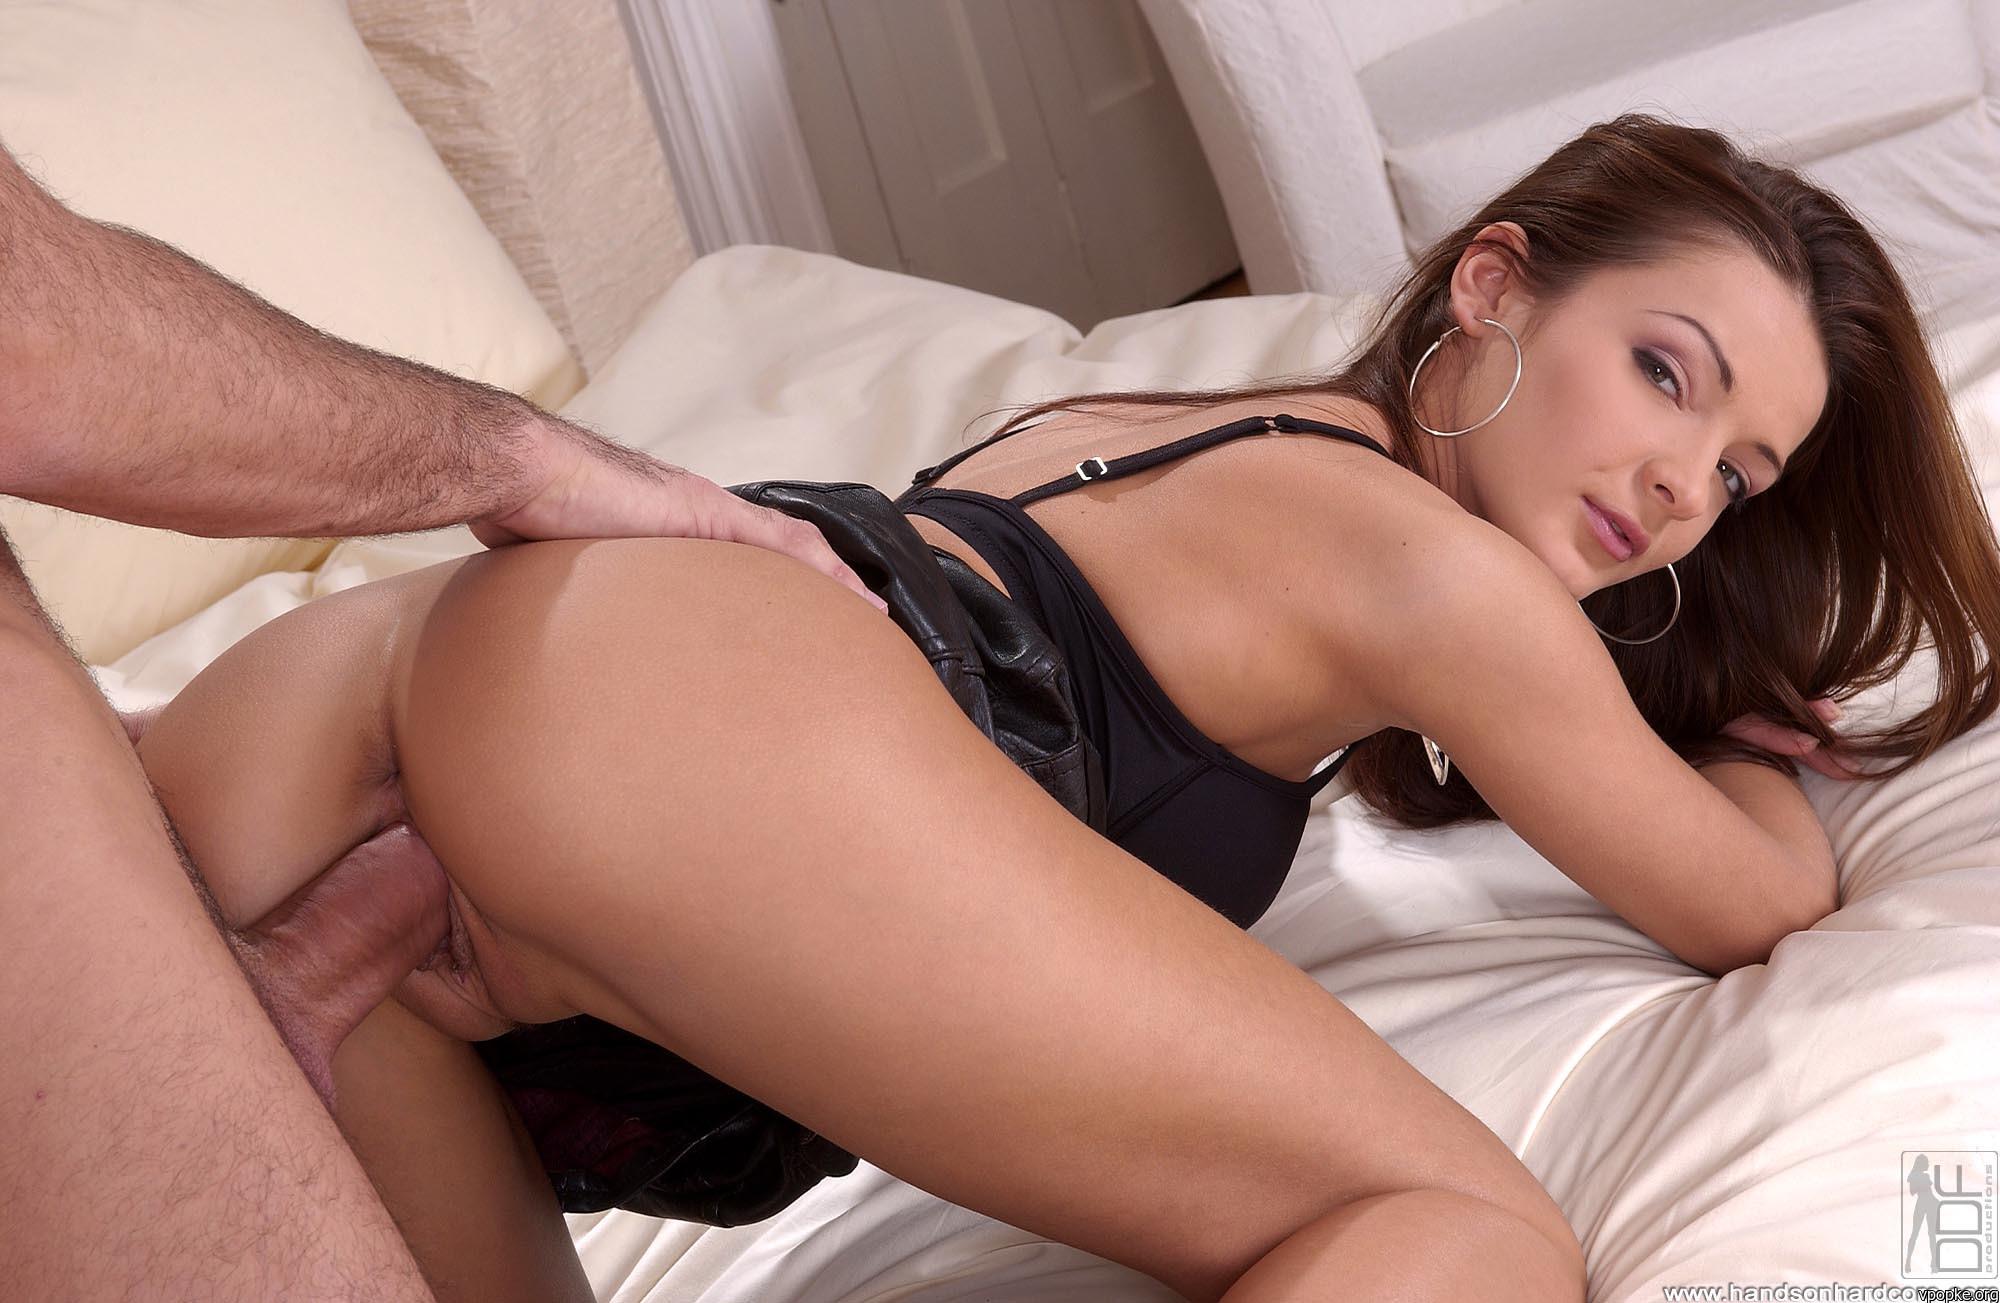 смотреть онлайн порно азиатка приставания